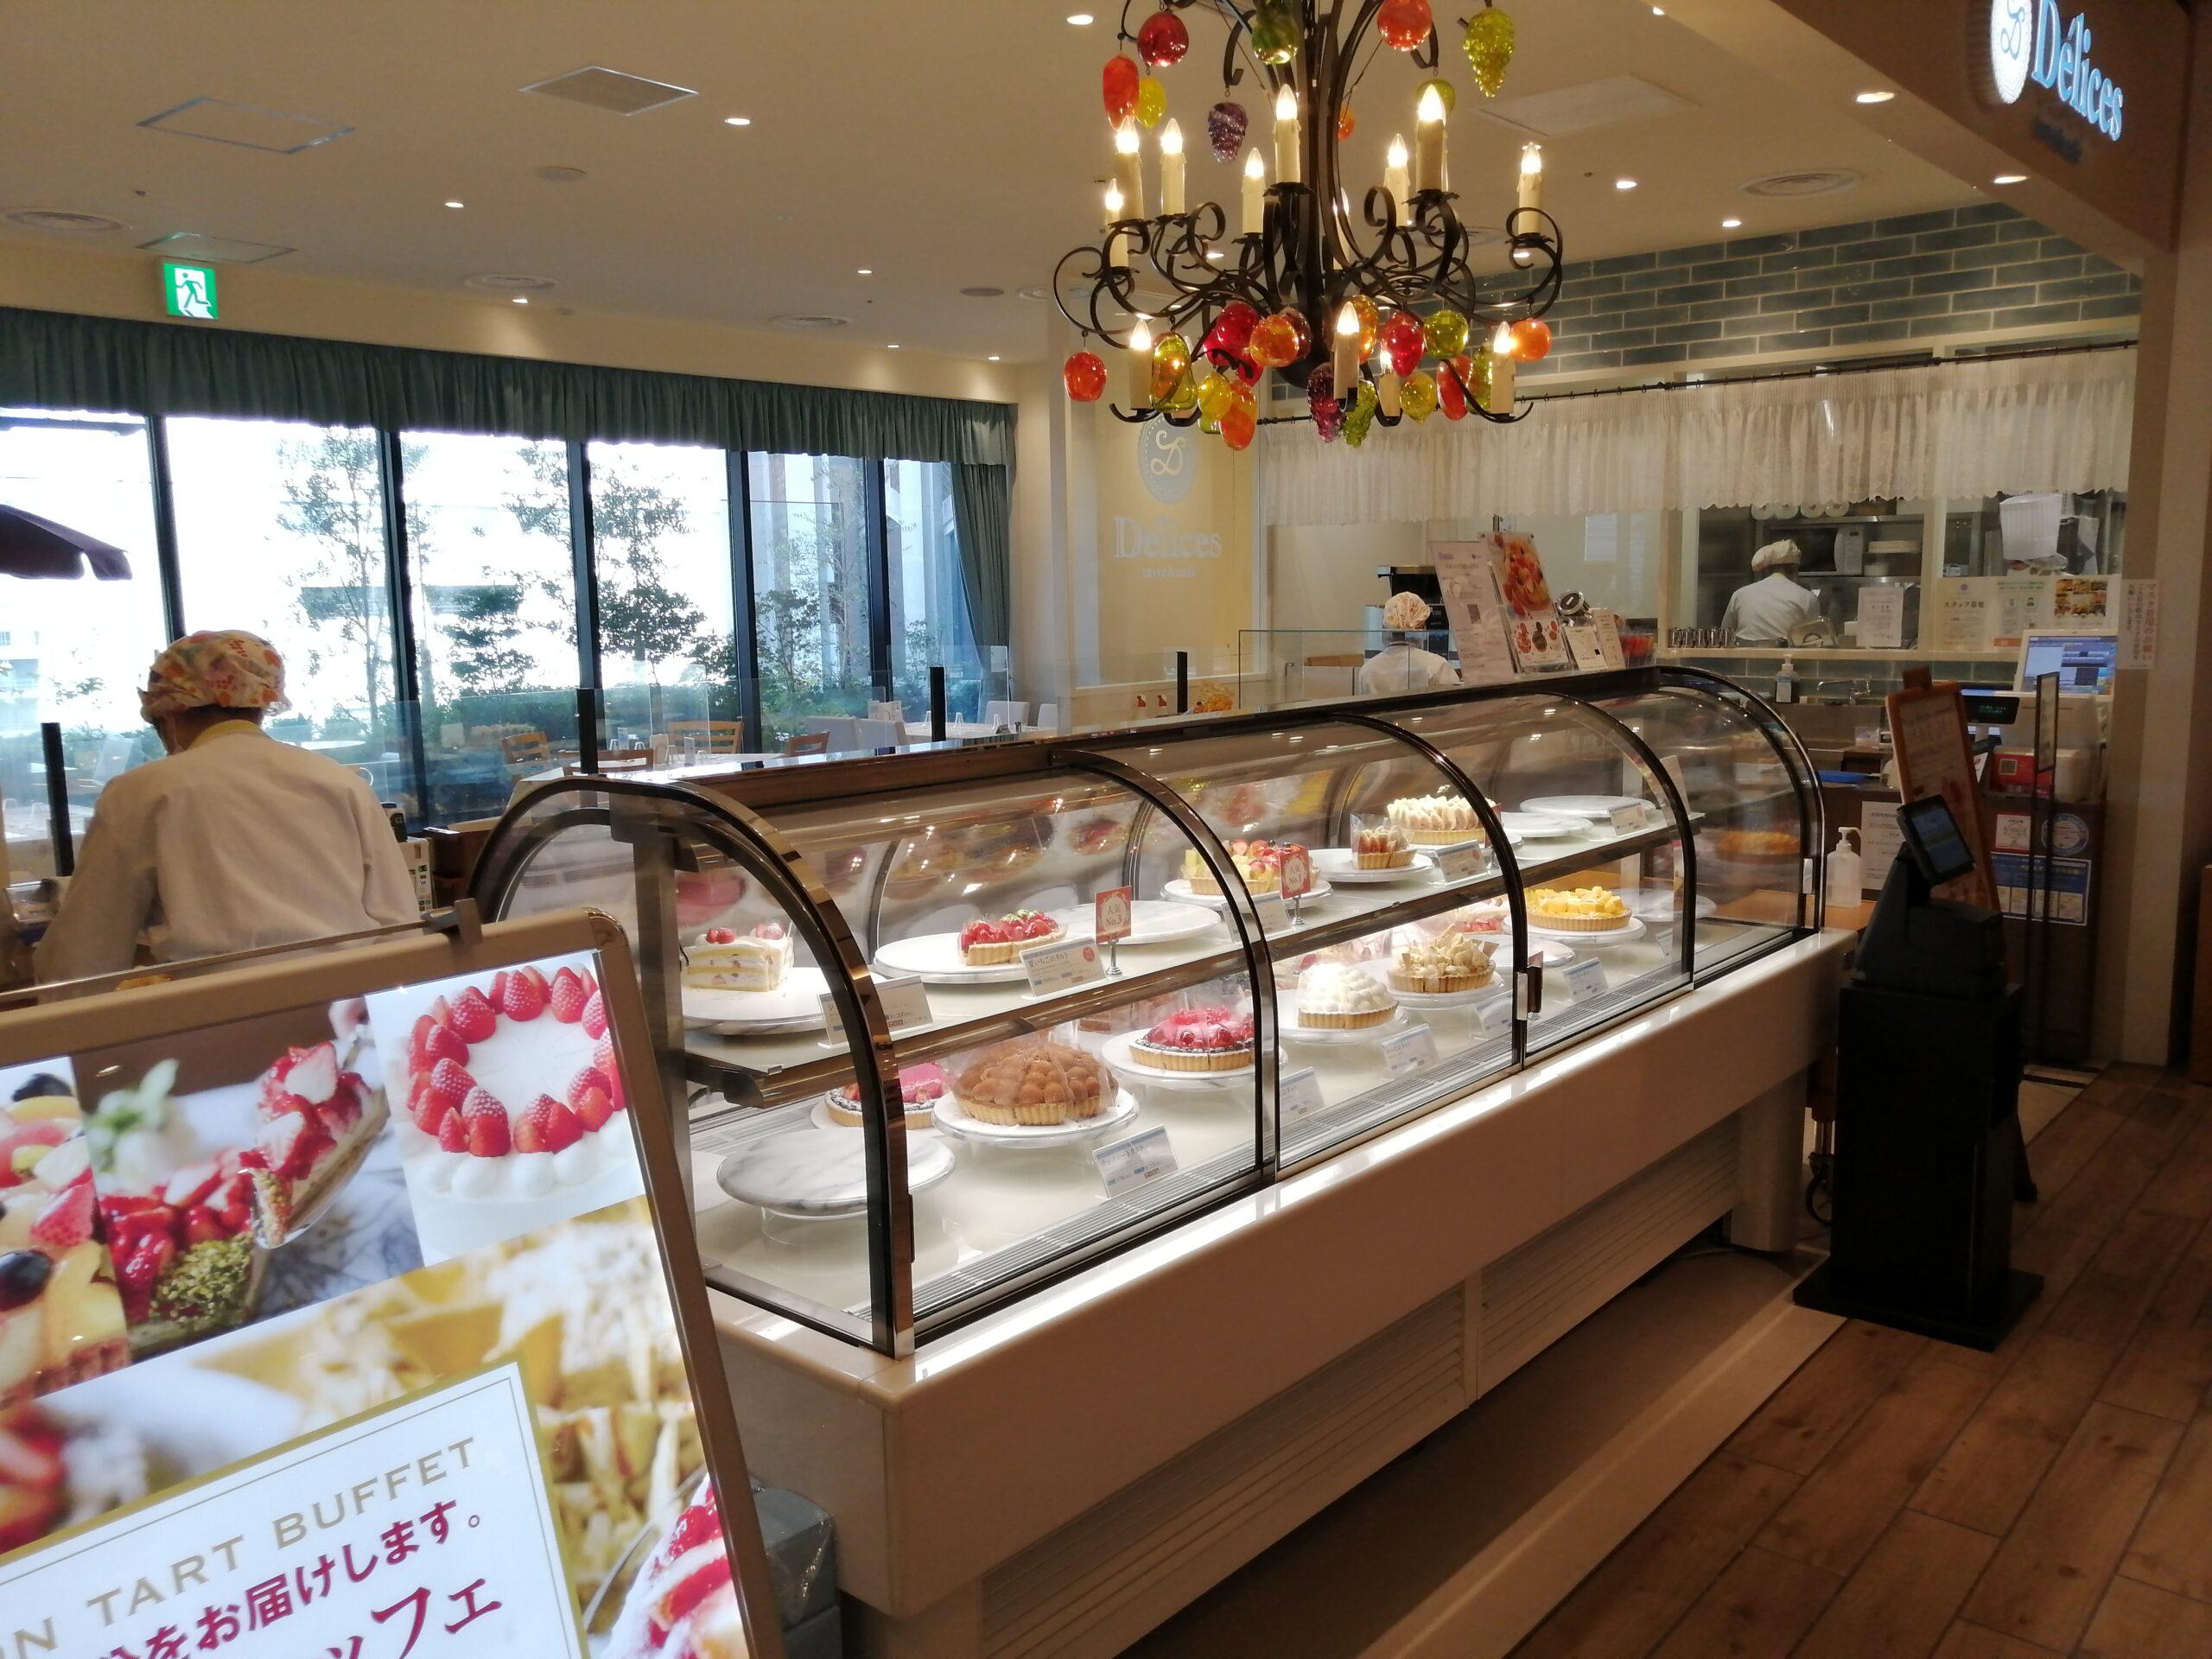 Delices tarte&cafe 大丸心斎橋店 訪問日 8/28